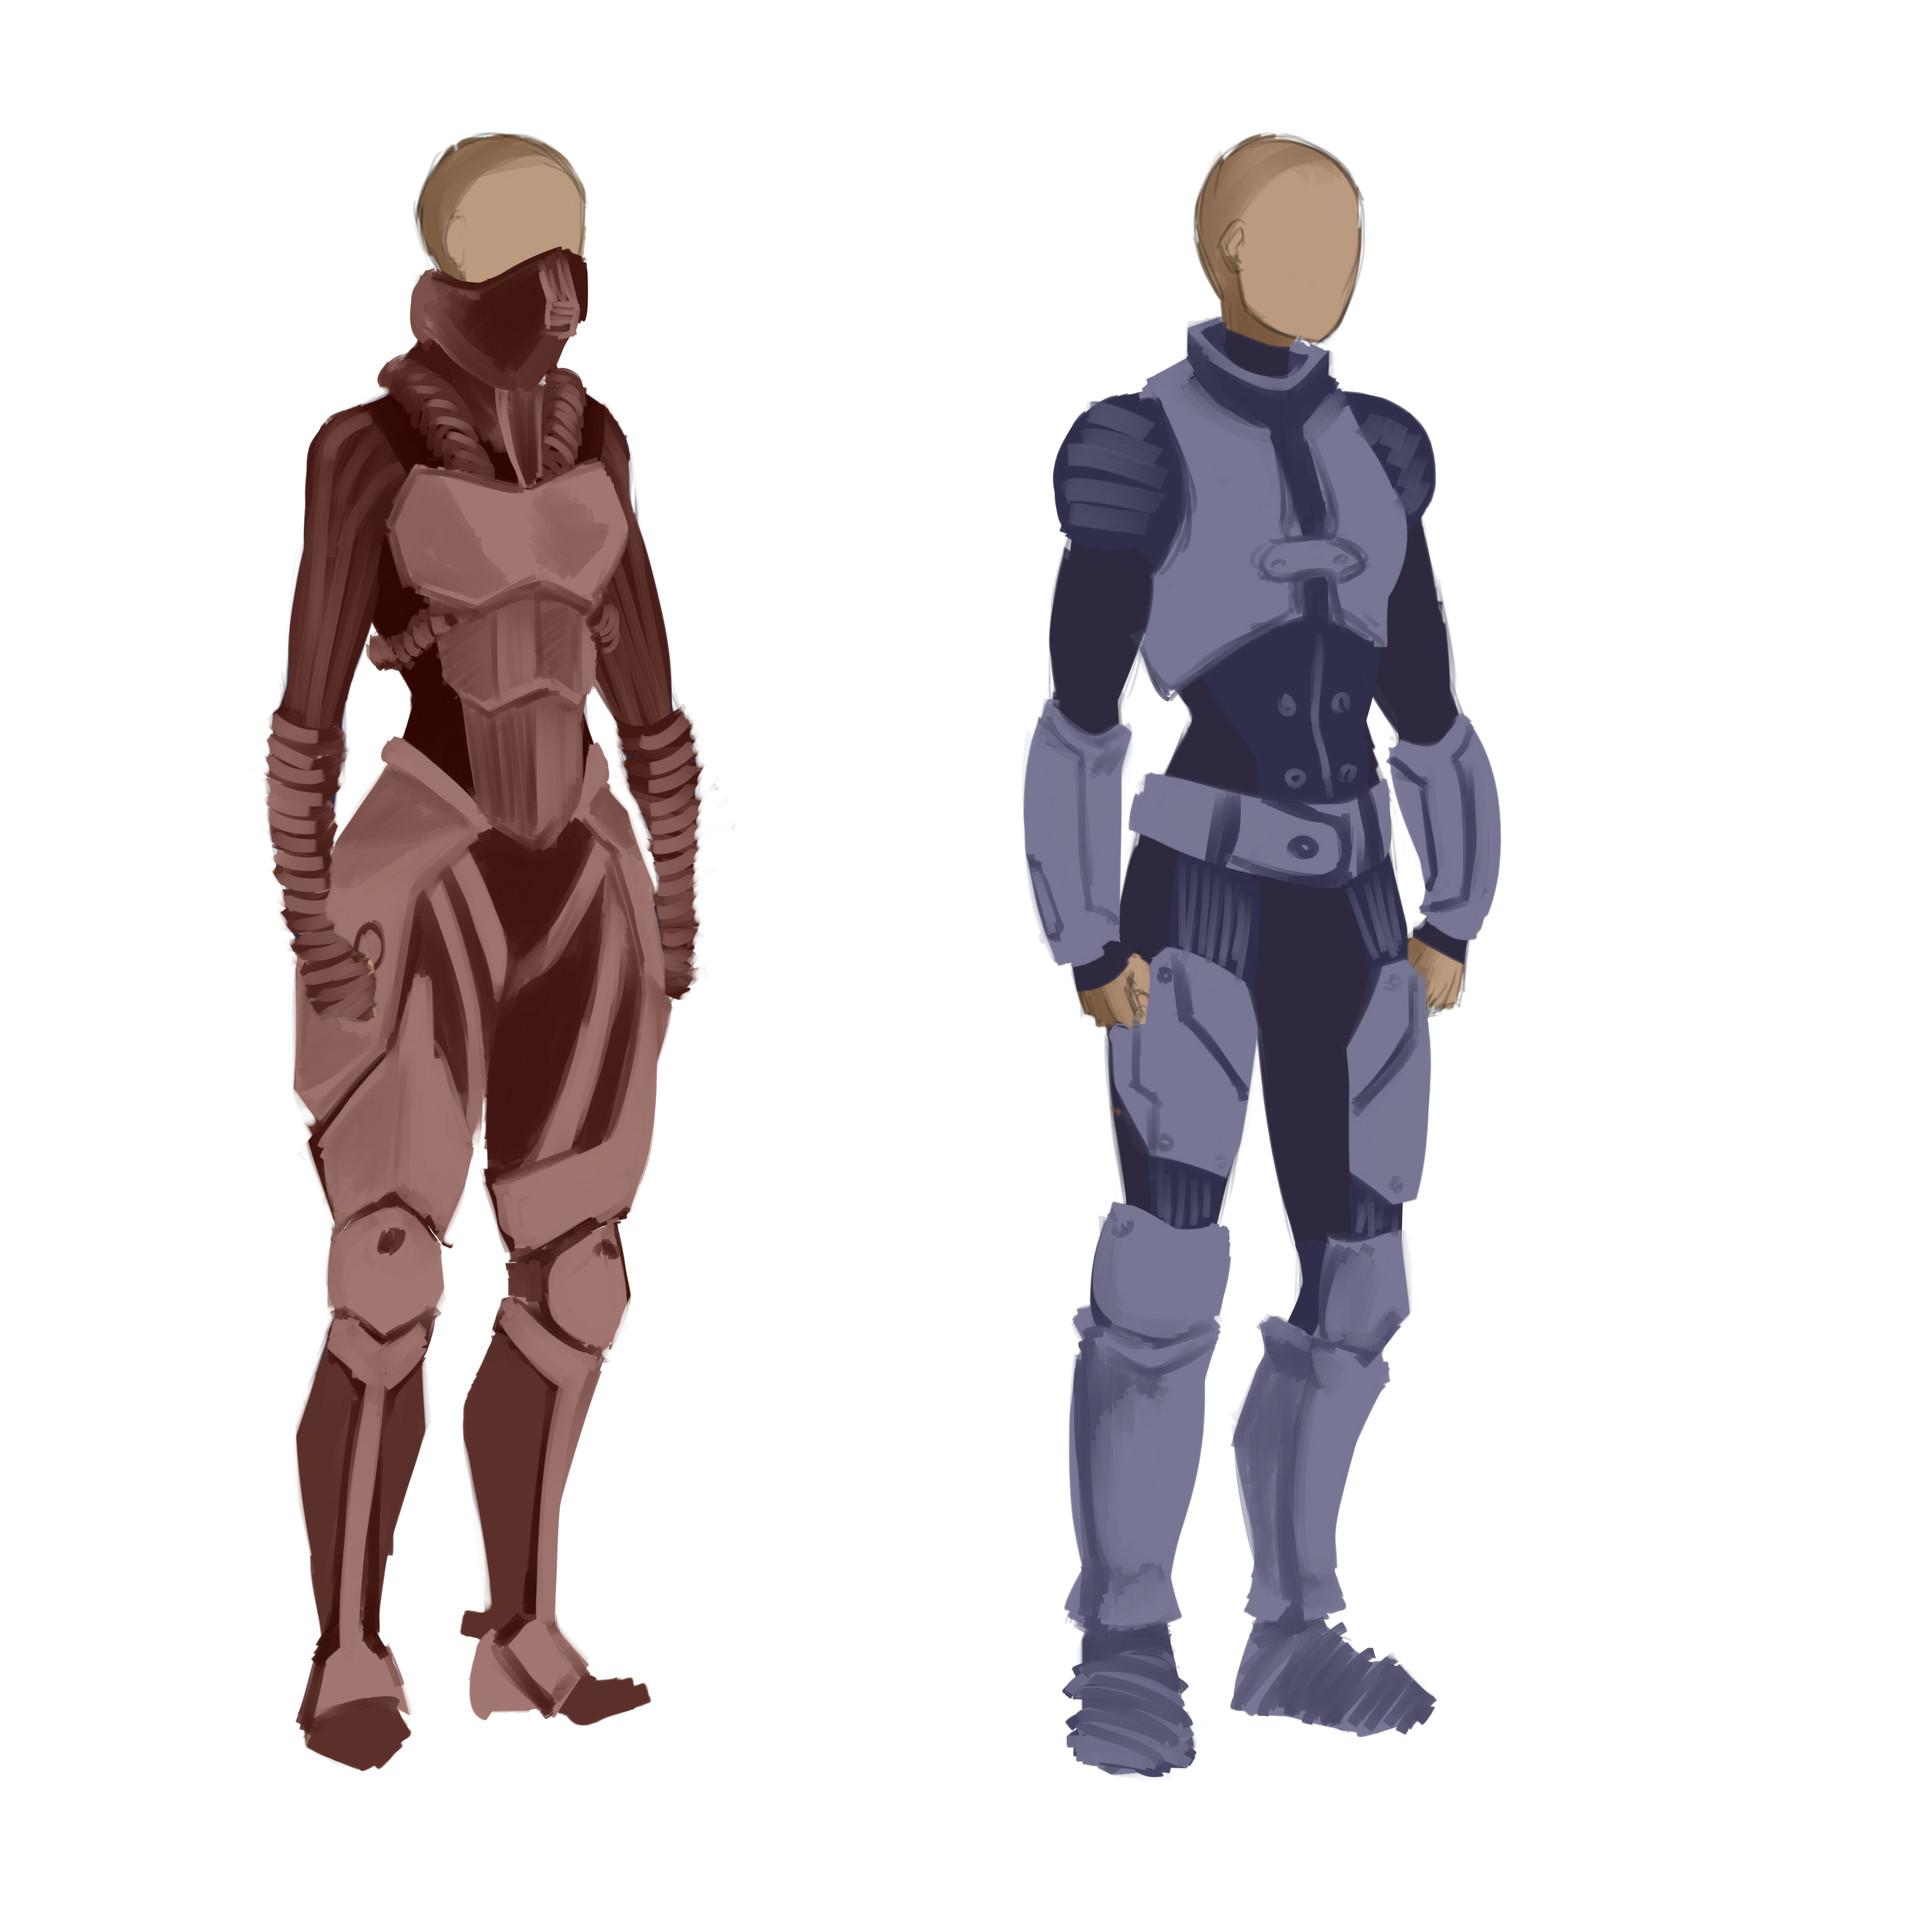 Xono - Concept Sketches Pt.2